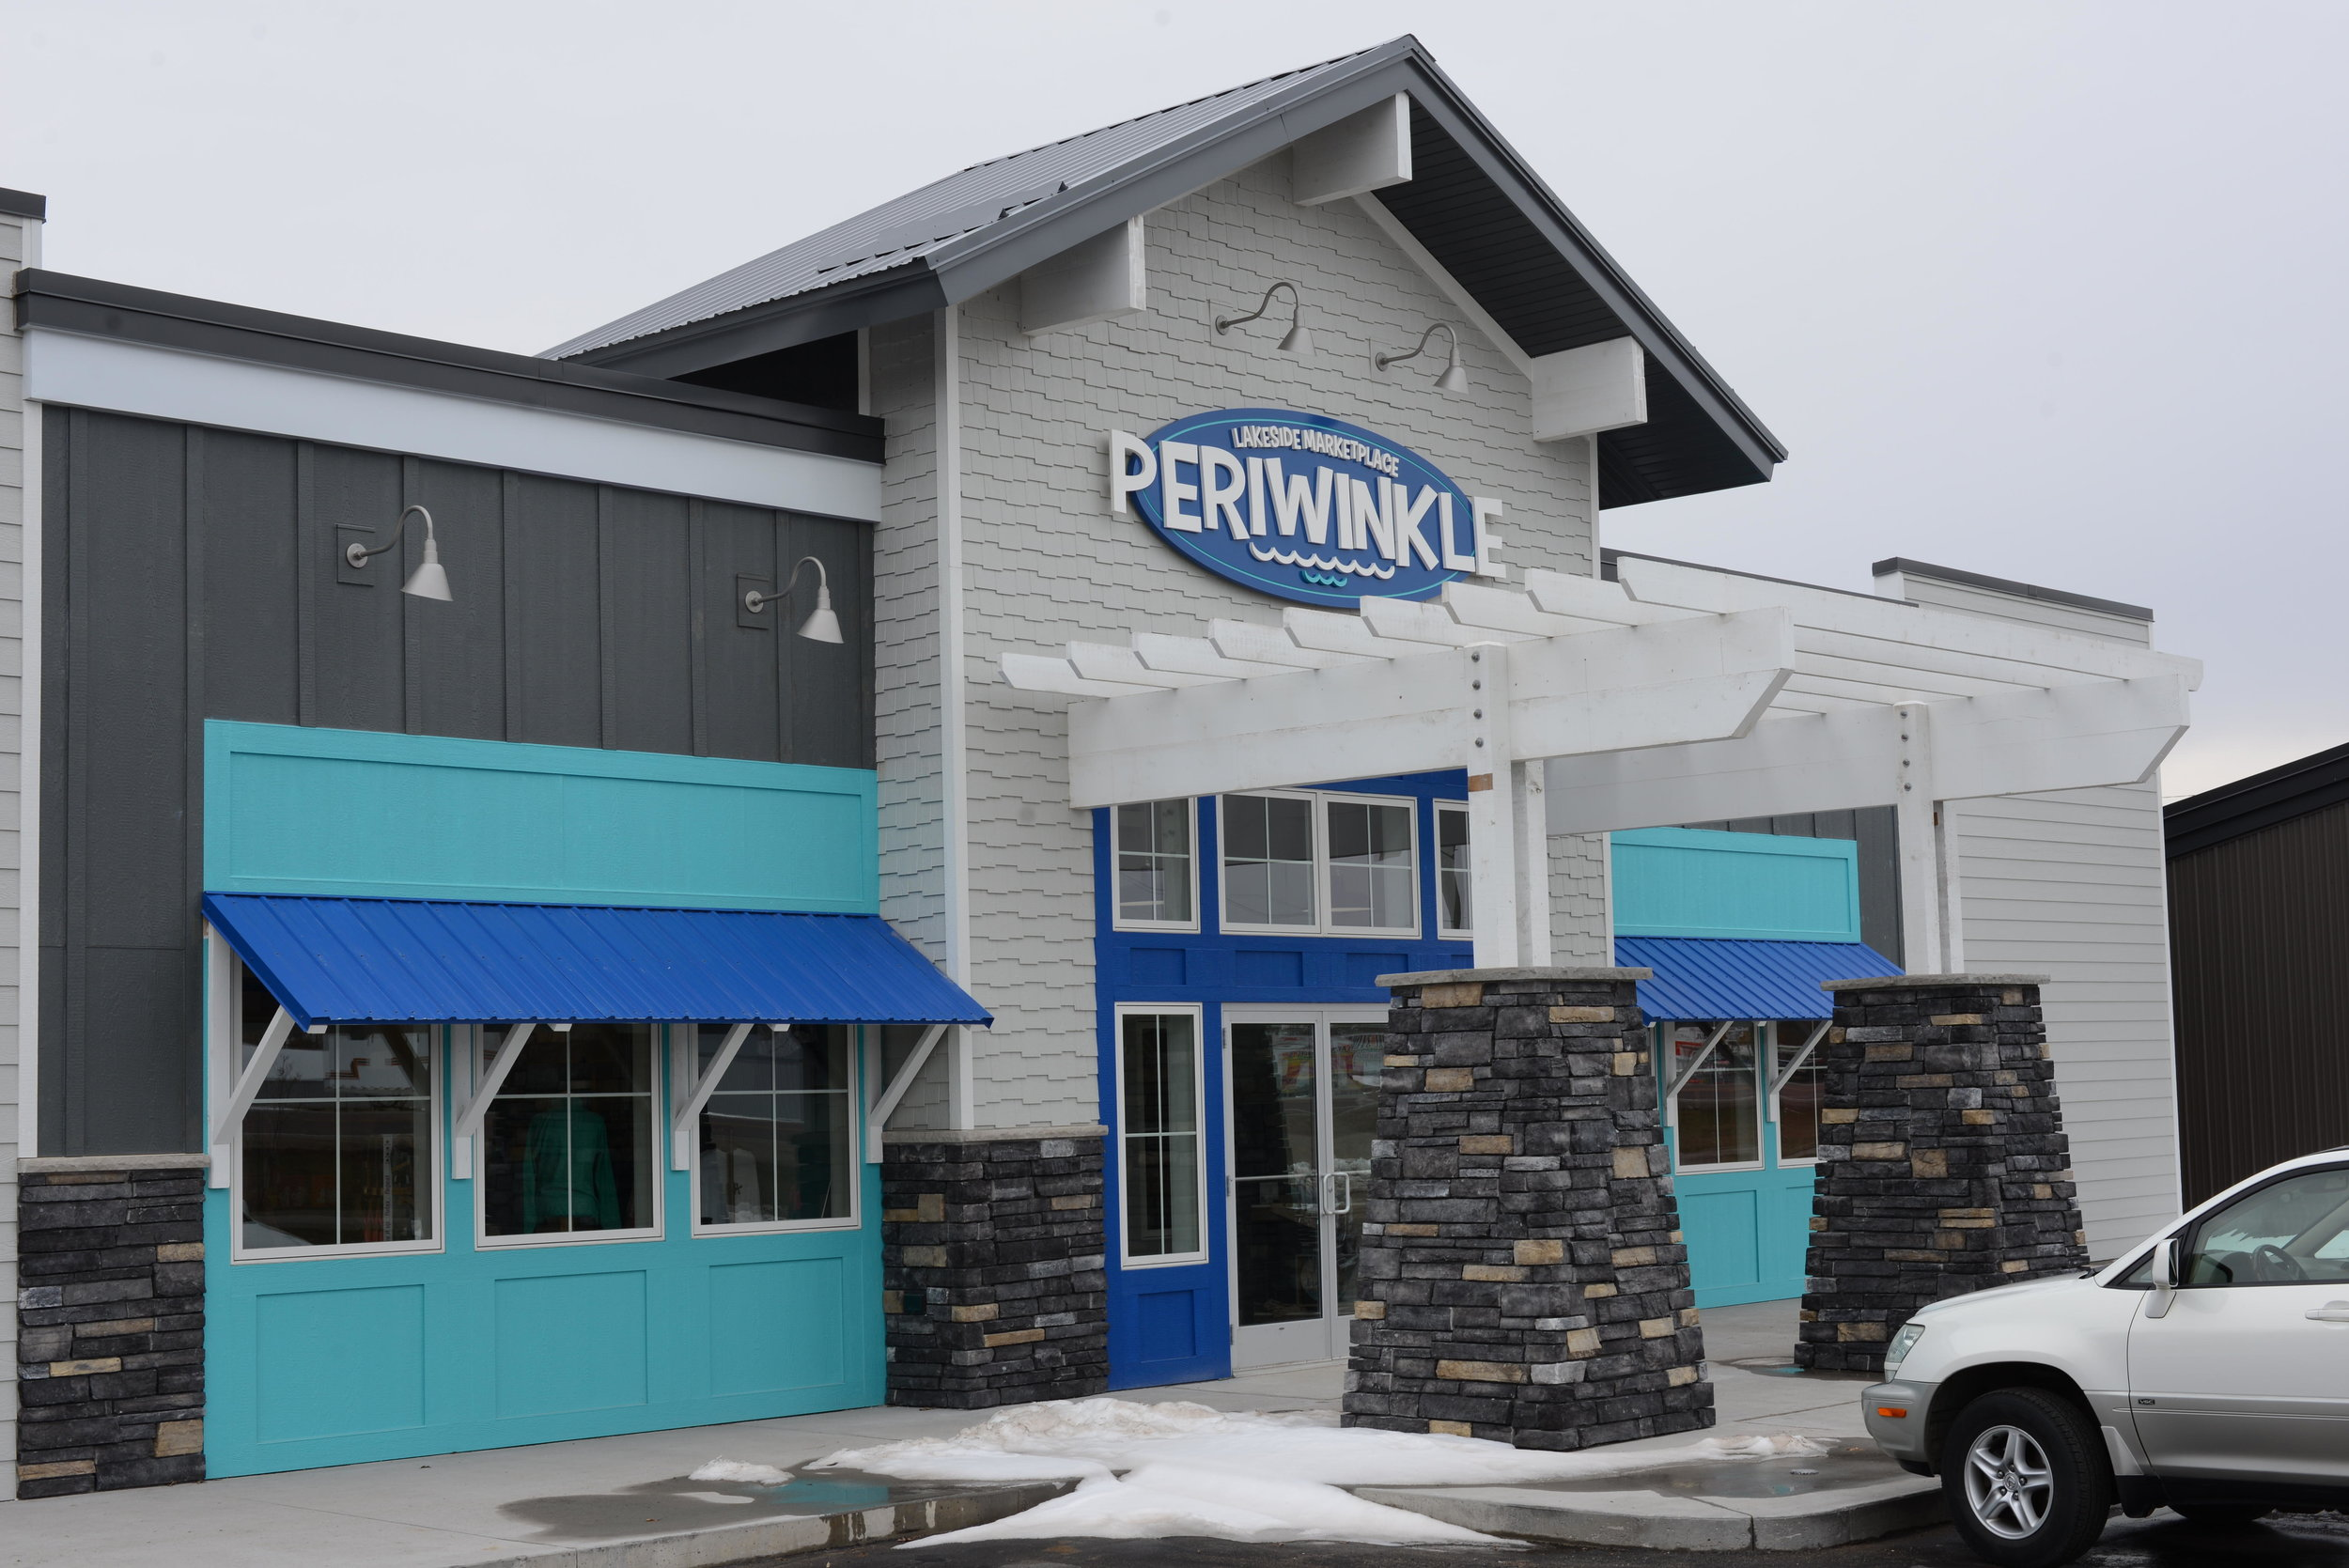 Periwinkle Marketplace is now open in Ottertail. (Carter Jones/ FOCUS)